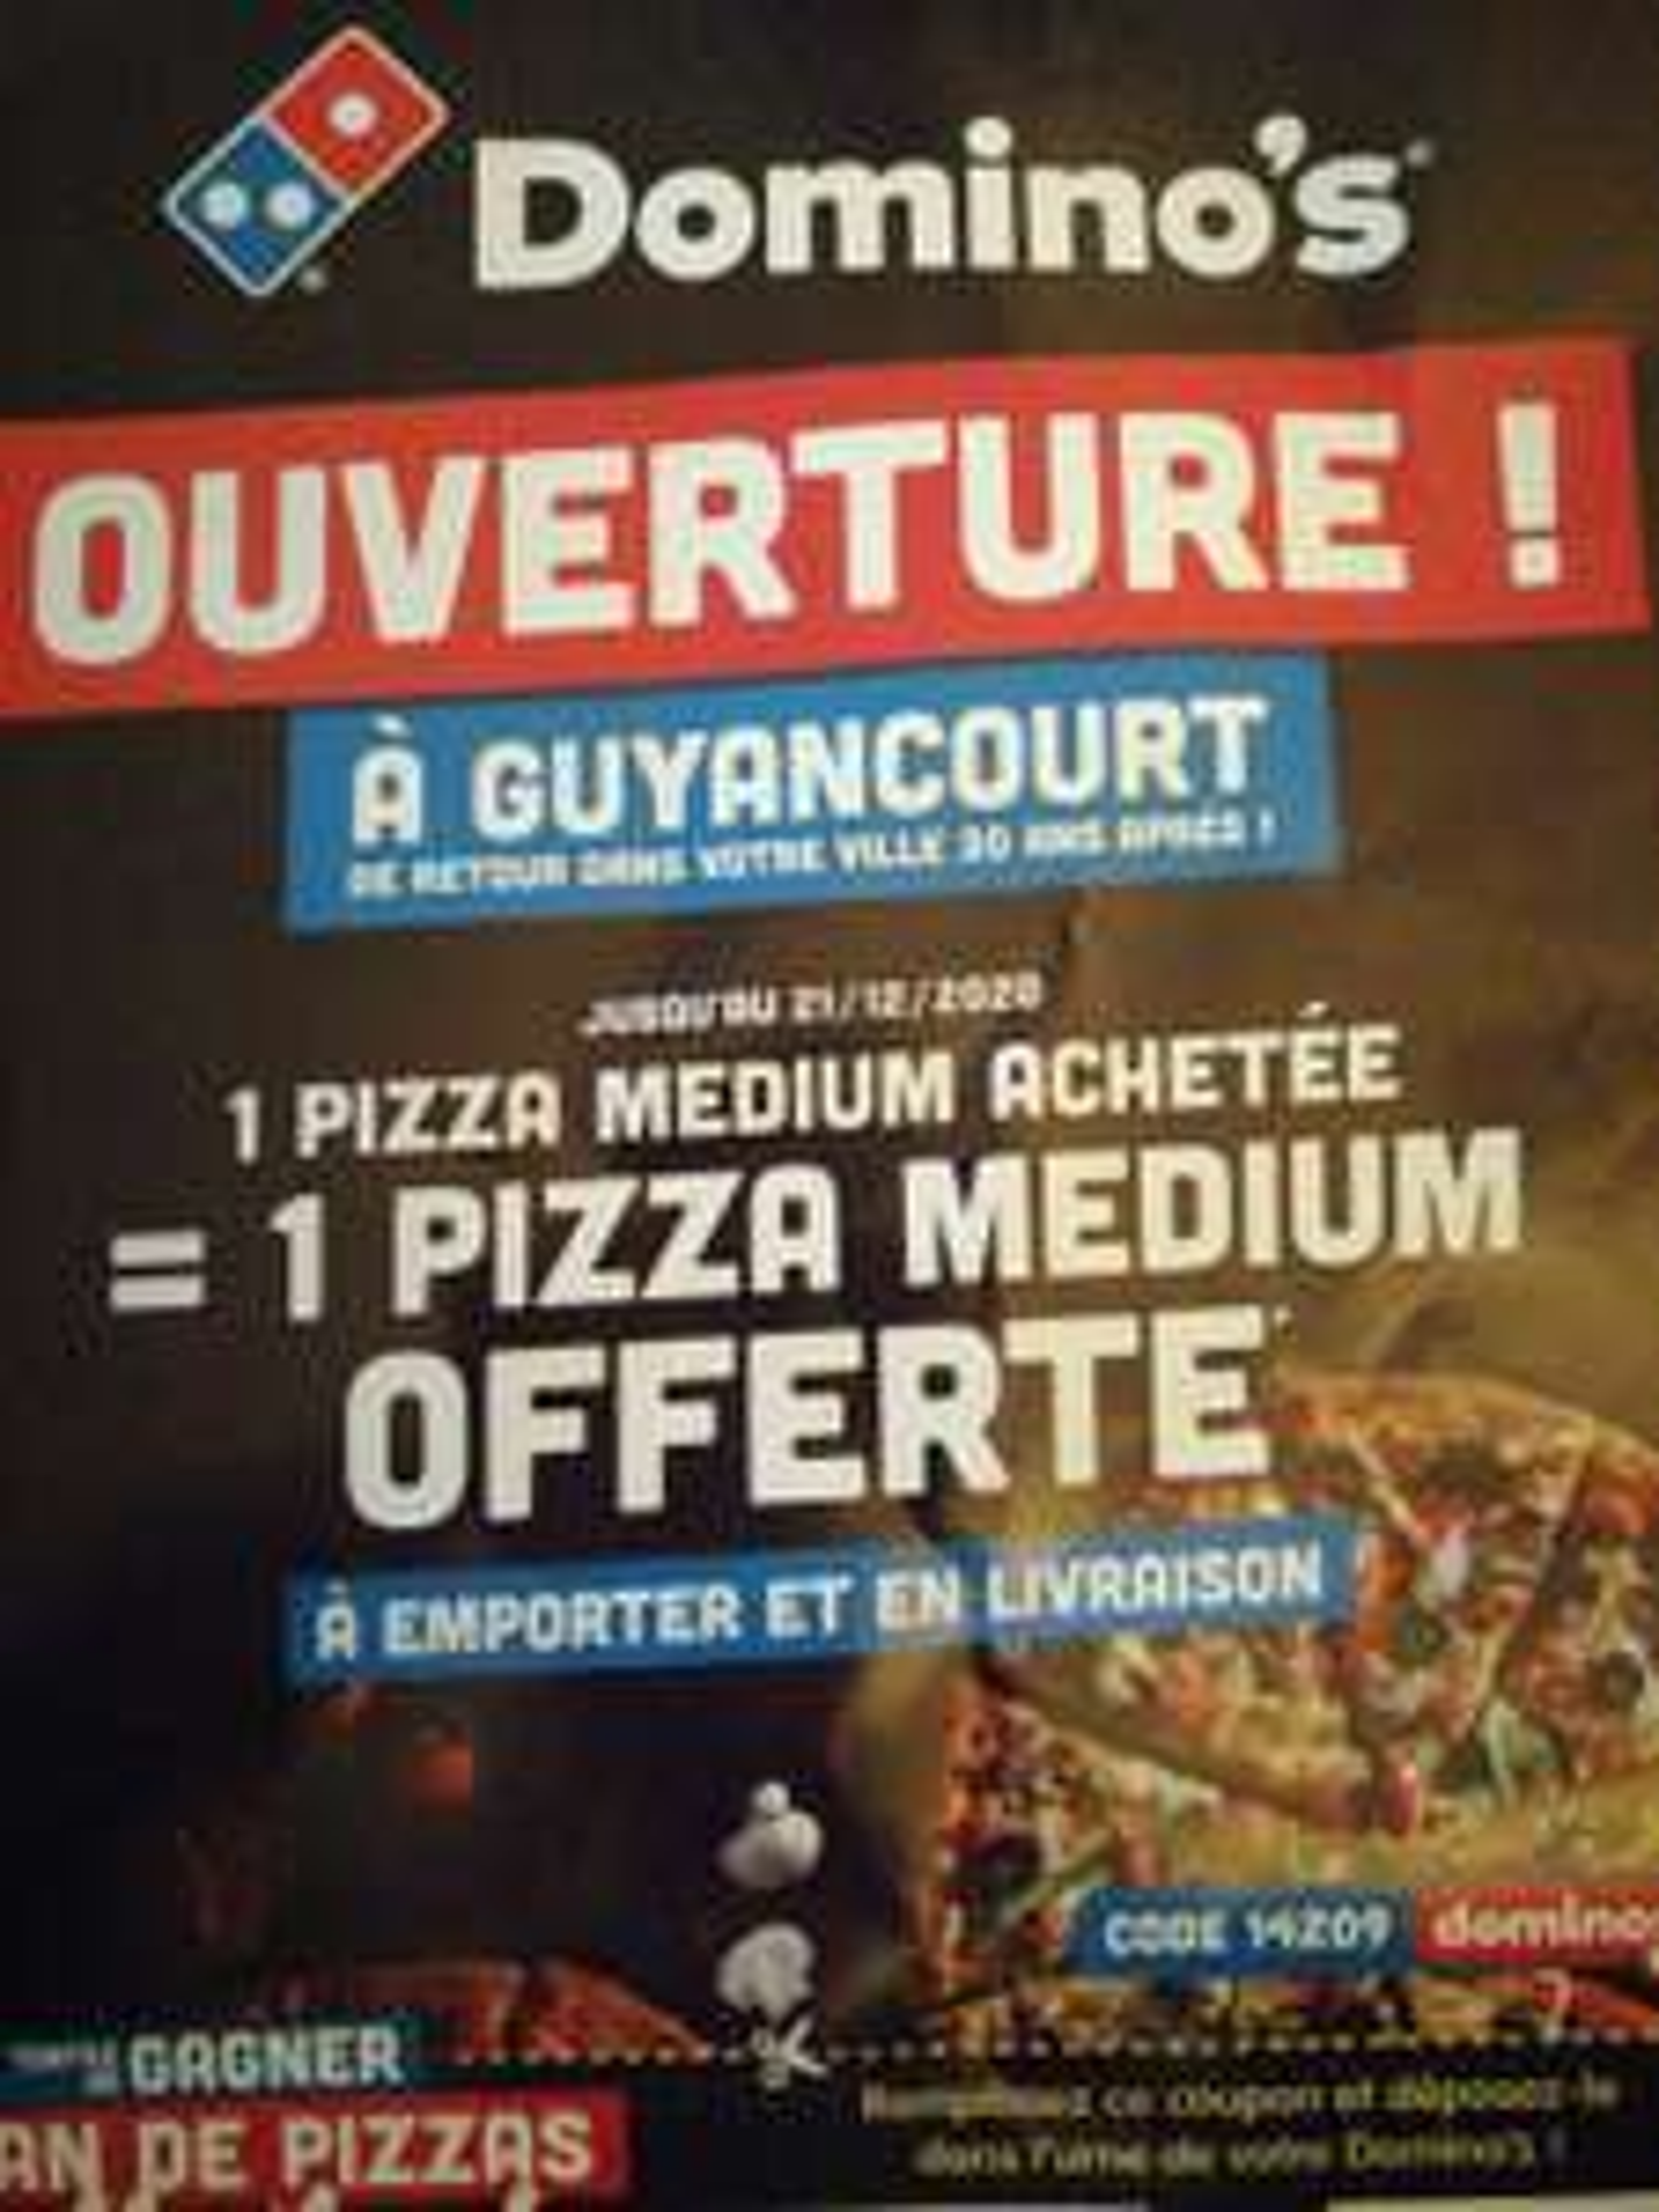 1 pizza médium achetée = 1 medium offerte - Guyancourt (78)